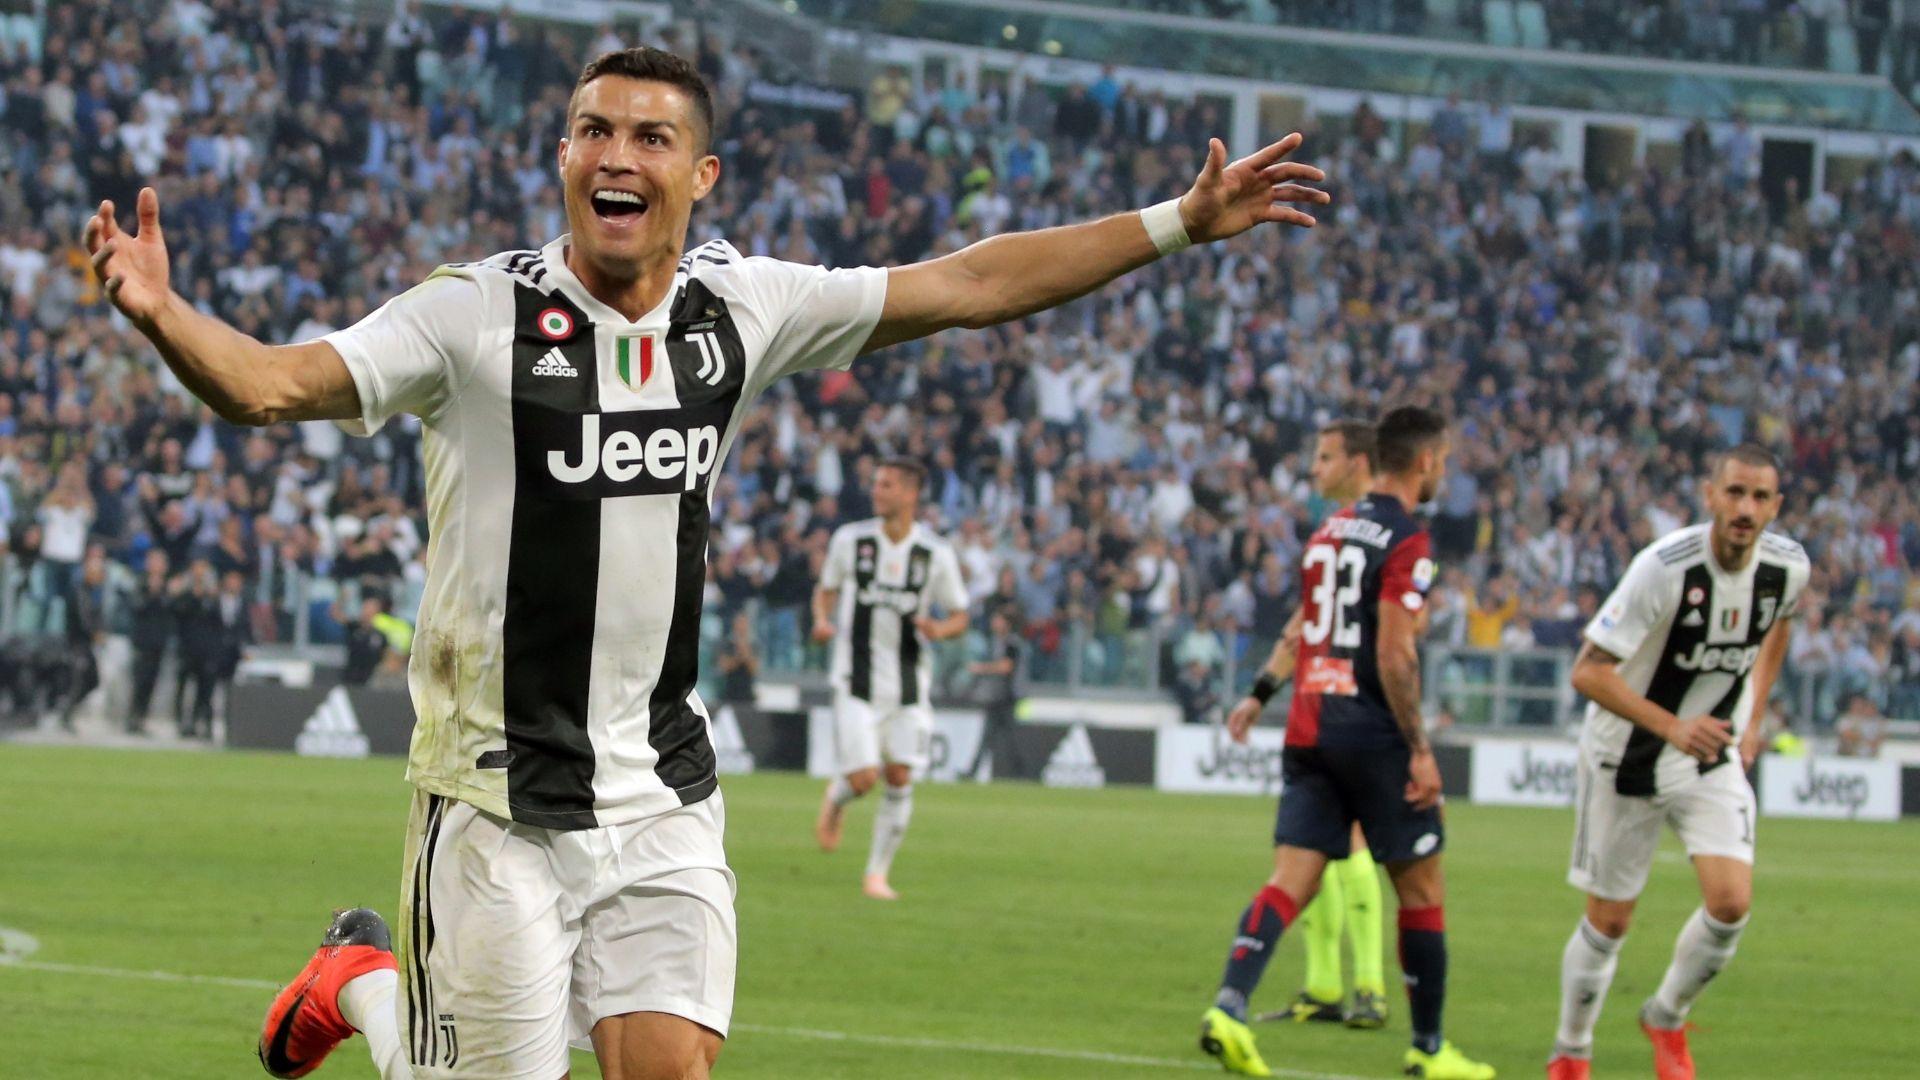 Serie A'da namağlup olan Juventus rekora koşuyor!